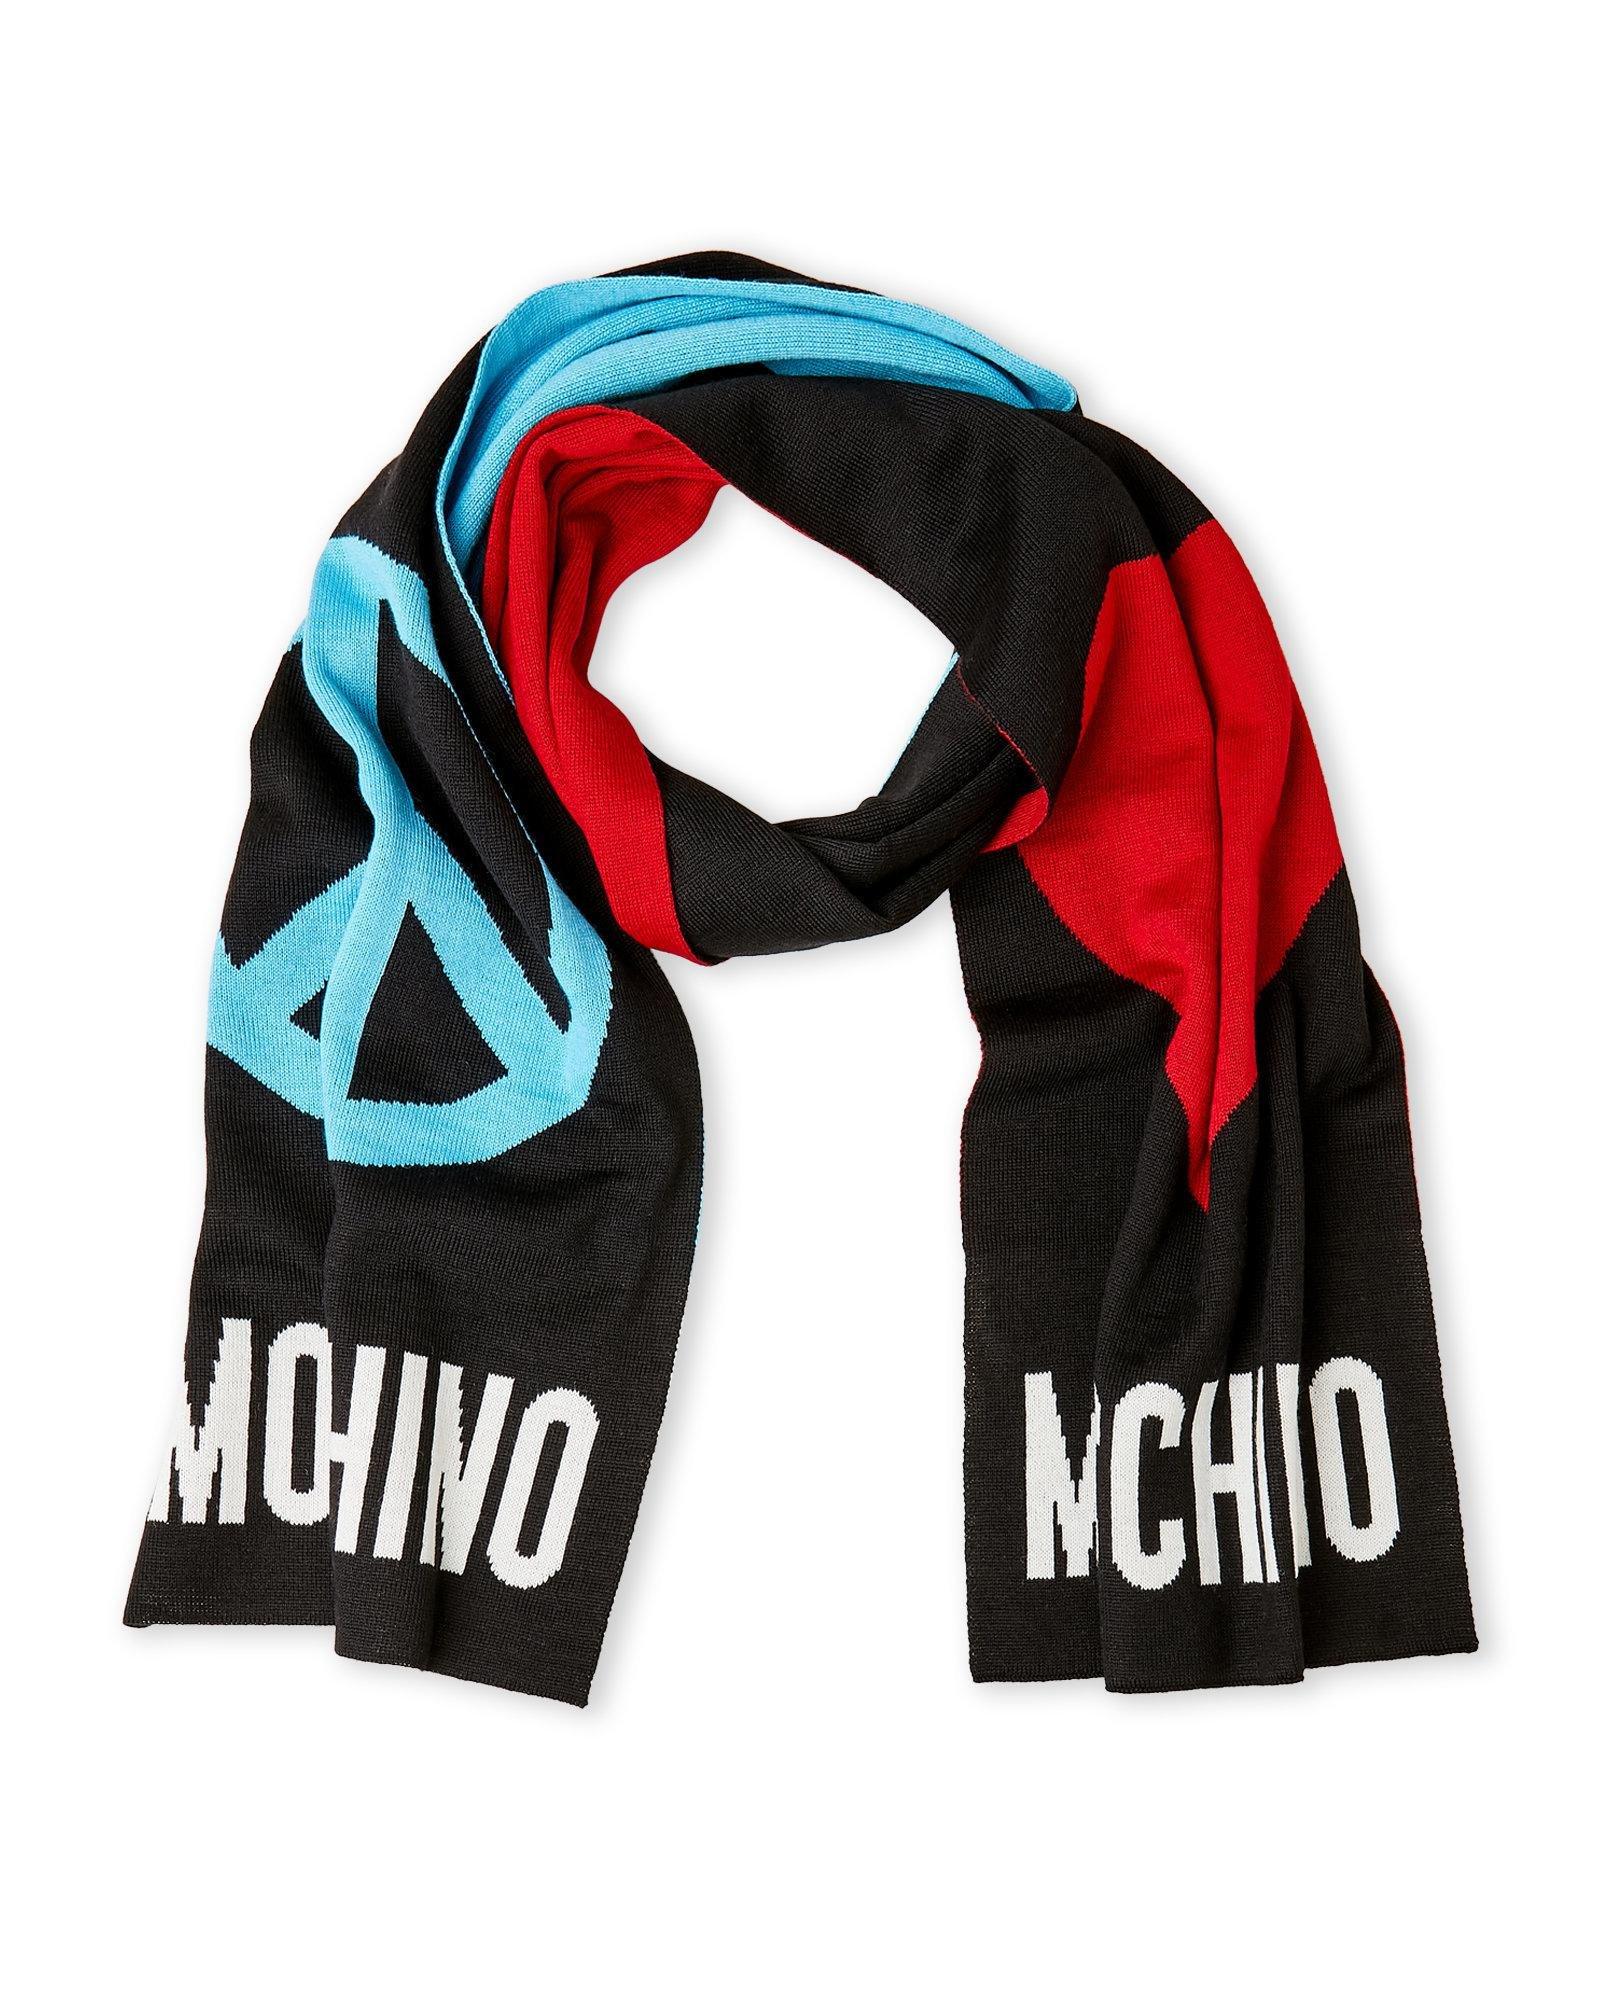 Moschino Women's Love & Peace Knit Scarf, Black Multi